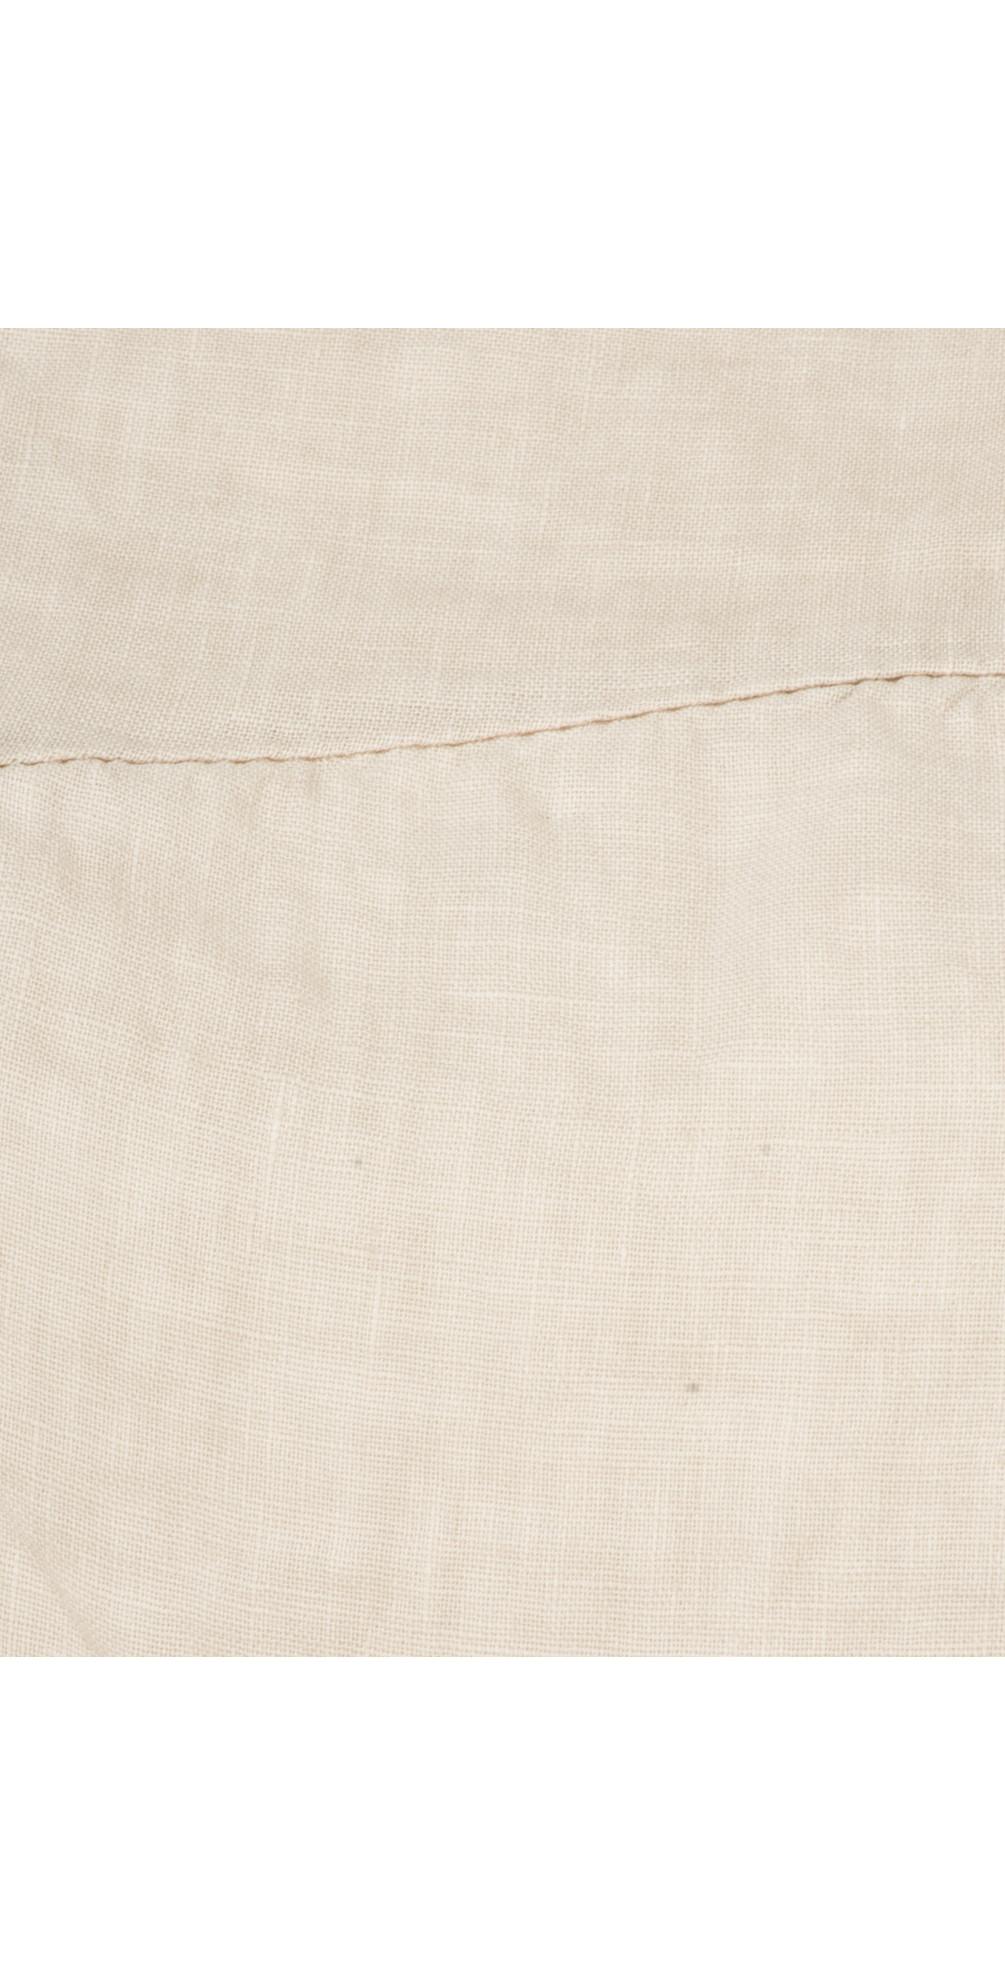 Bobbie Linen Asymmetric Top main image